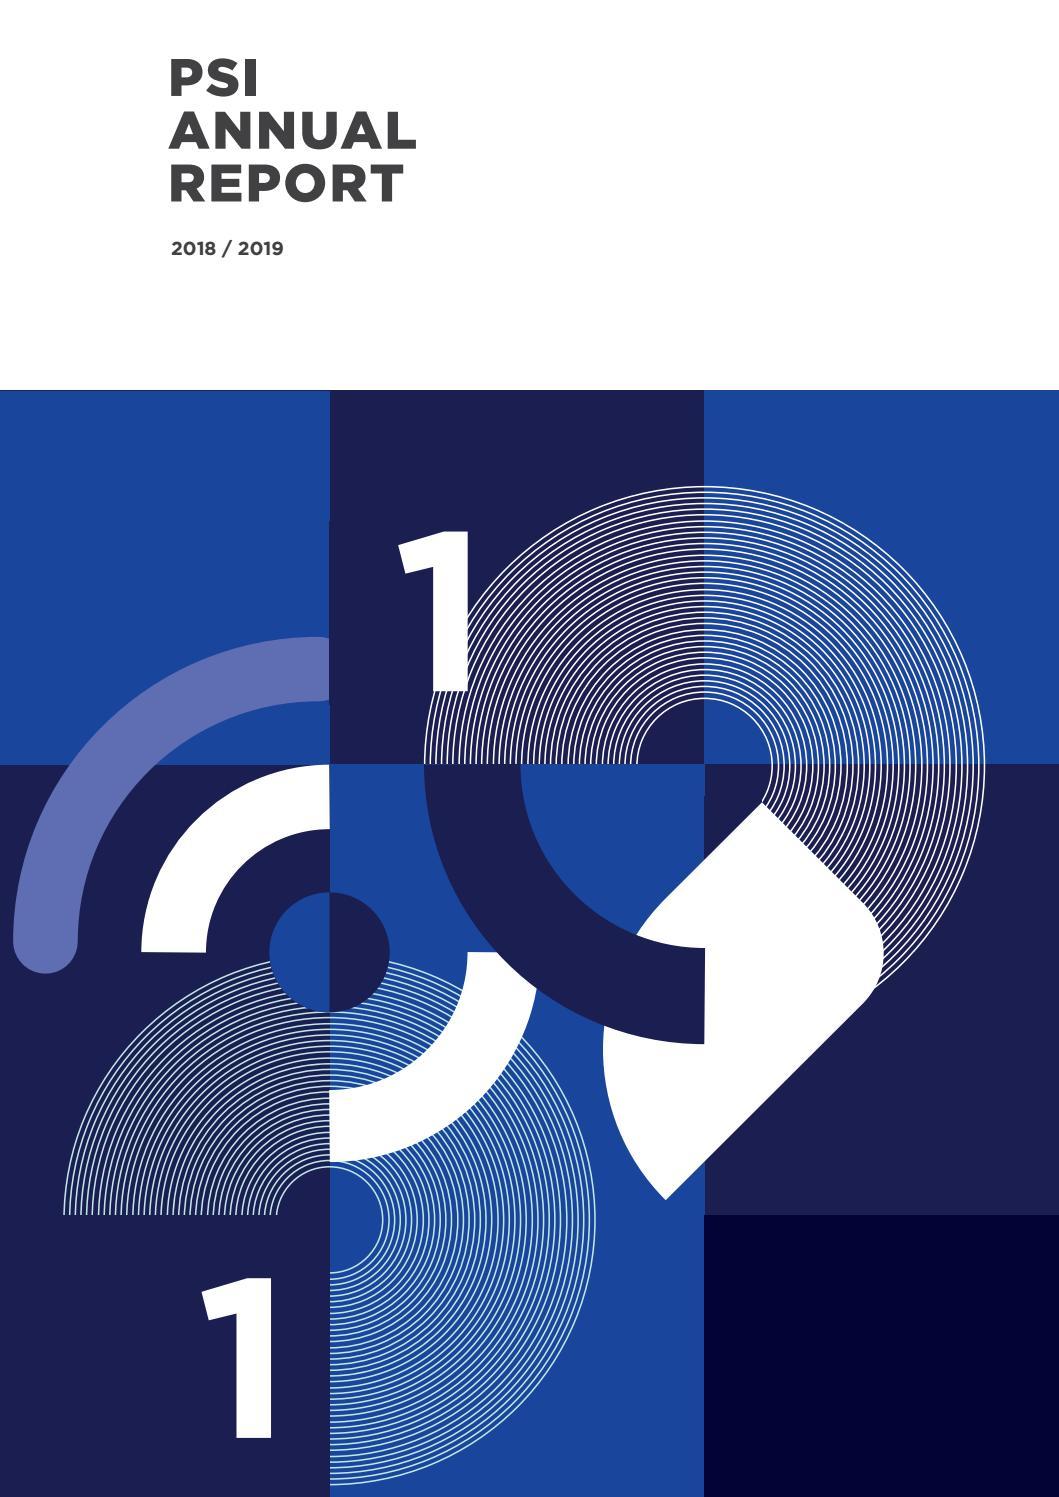 Annual Report 201819 By Pechersk School International  Issuu with regard to Nus Academic Calendar 2018/19